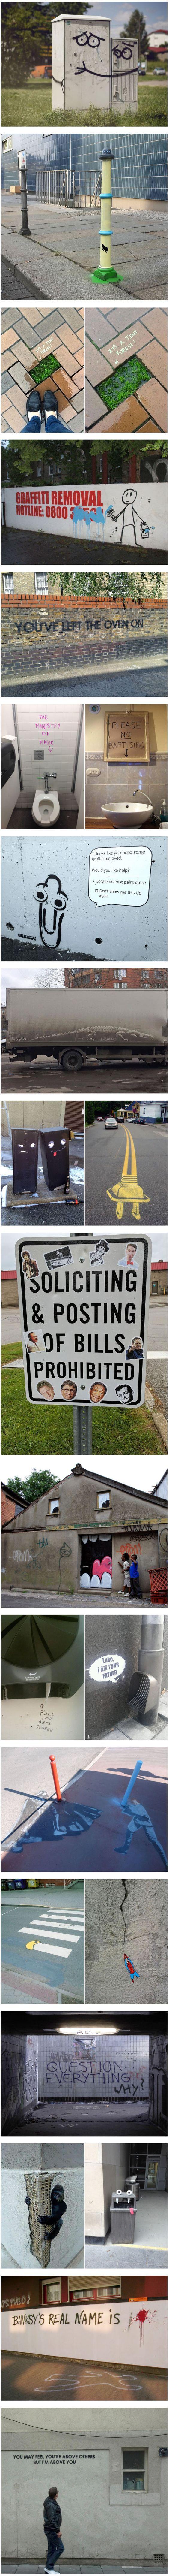 Random Acts of Brilliant Vandalism